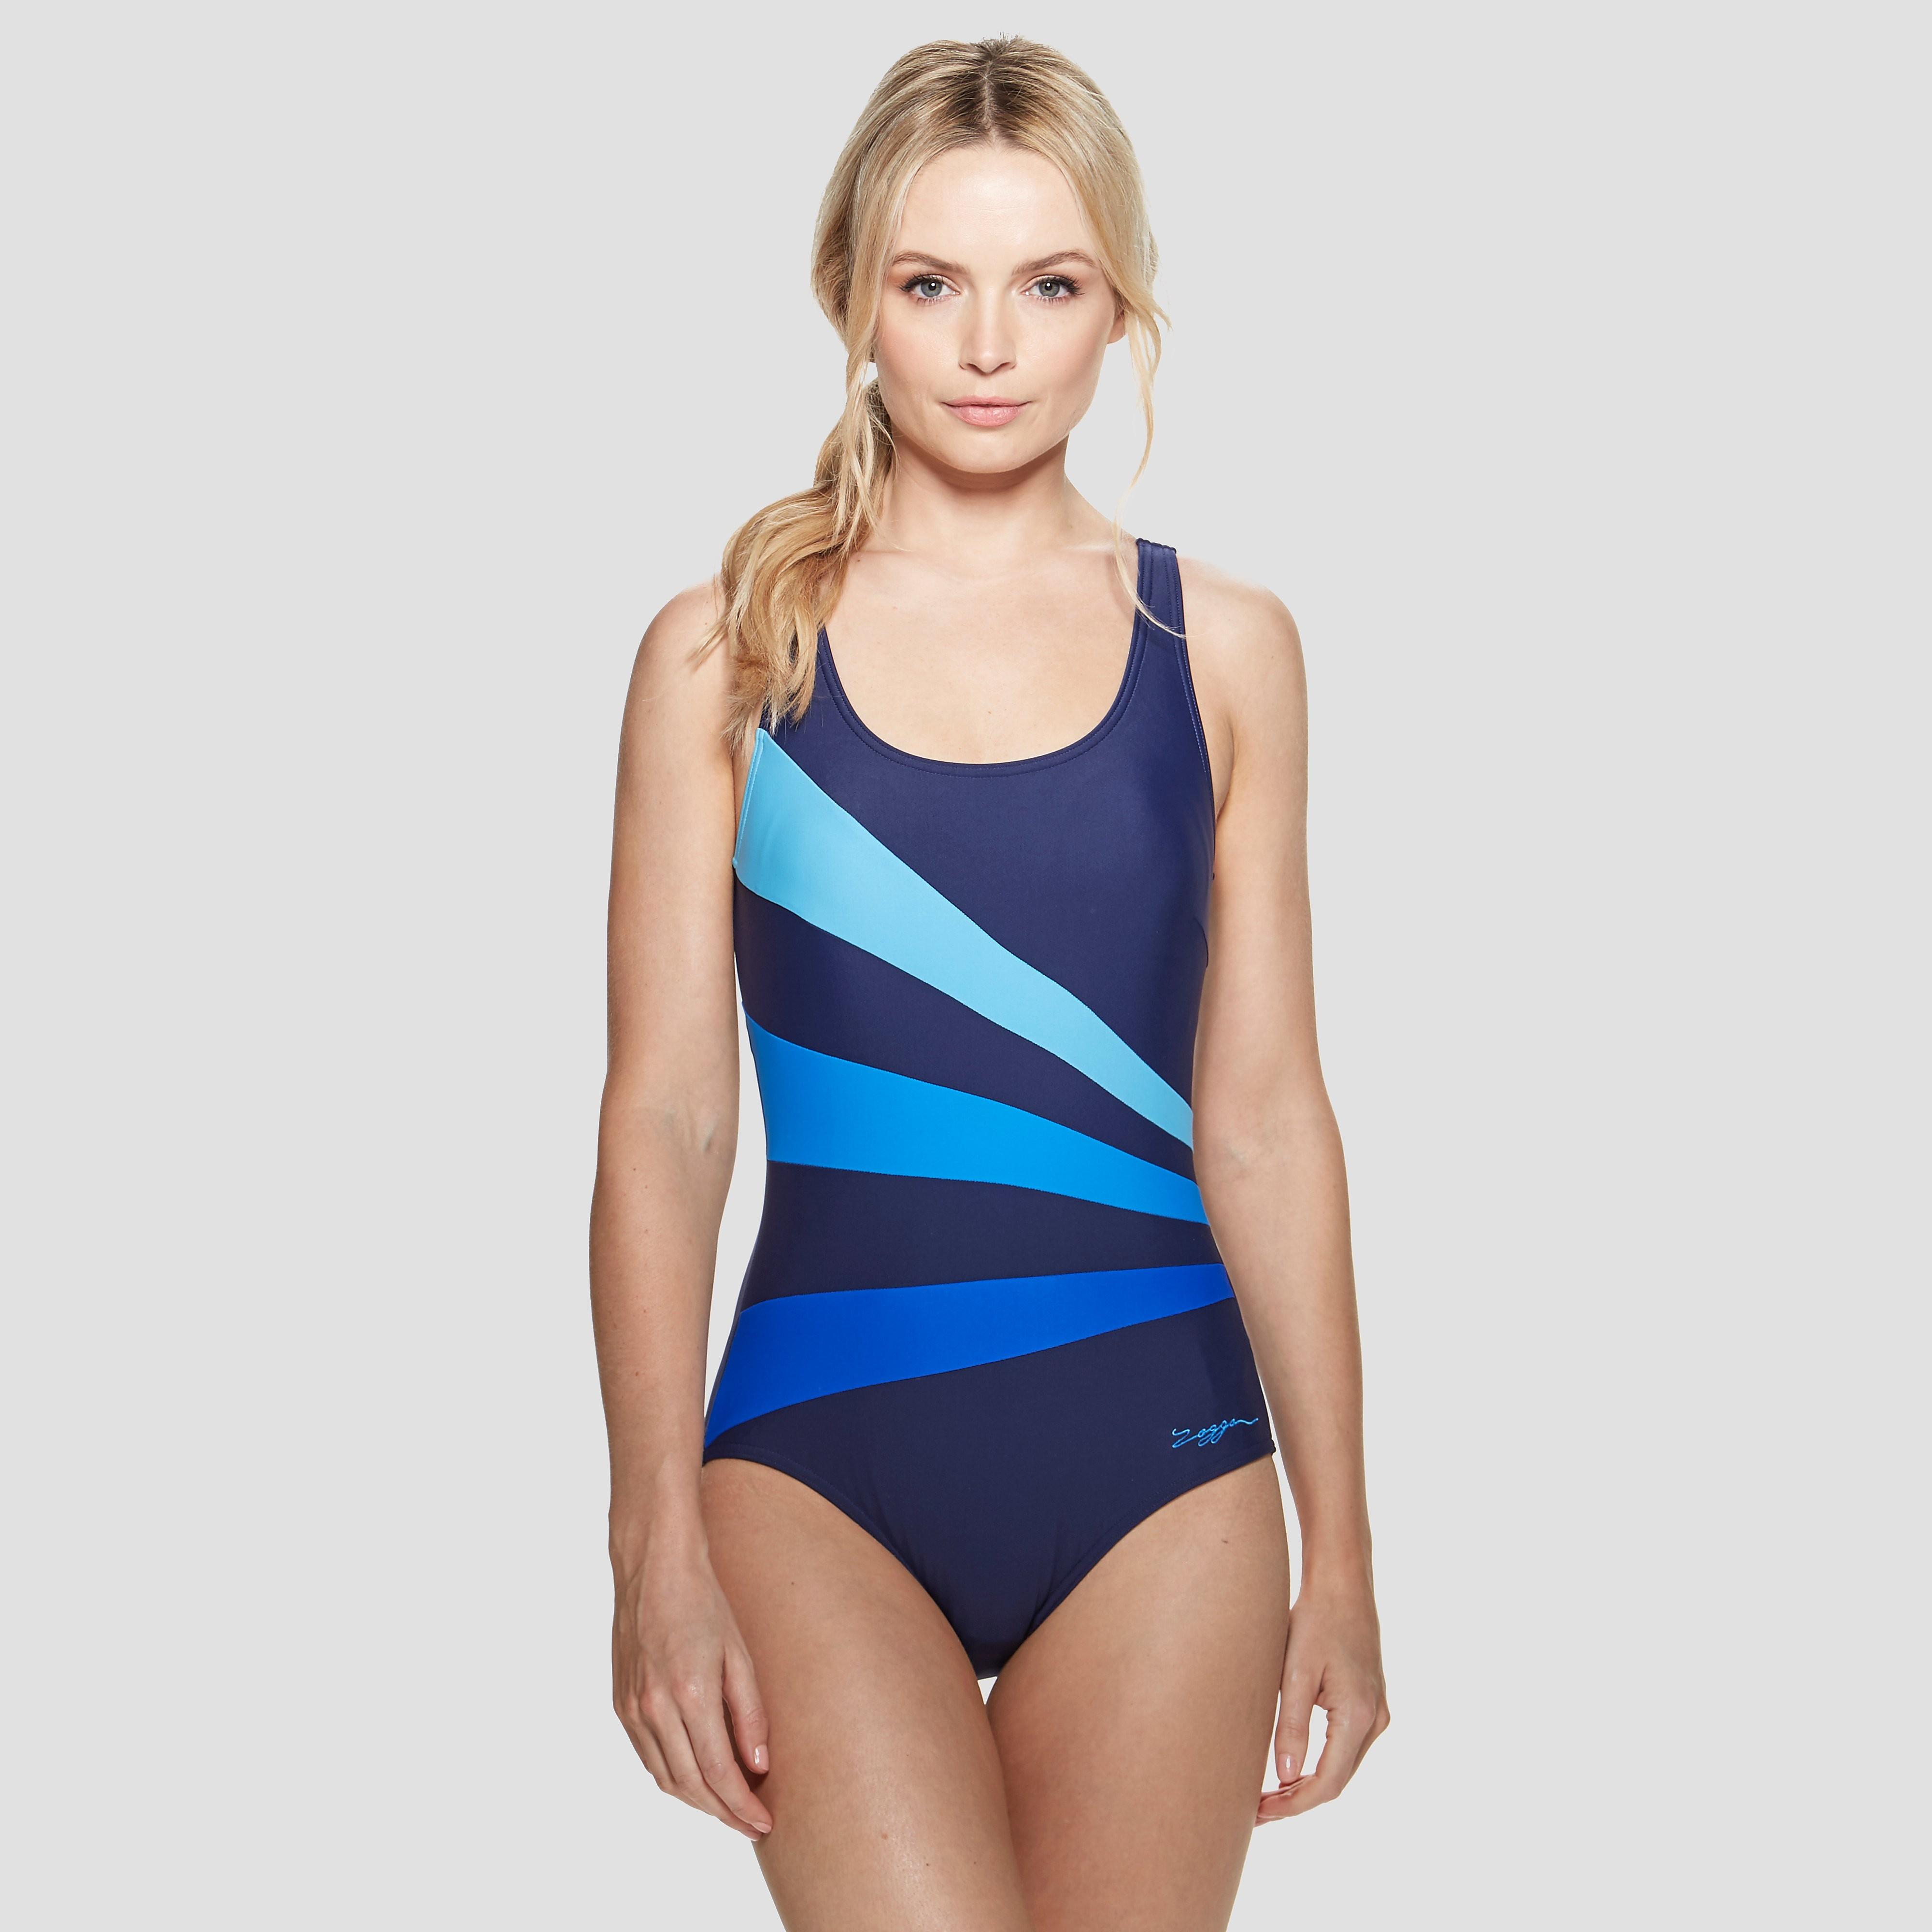 Zoggs Craftwork Sandon Scoopback Women's Swimsuit